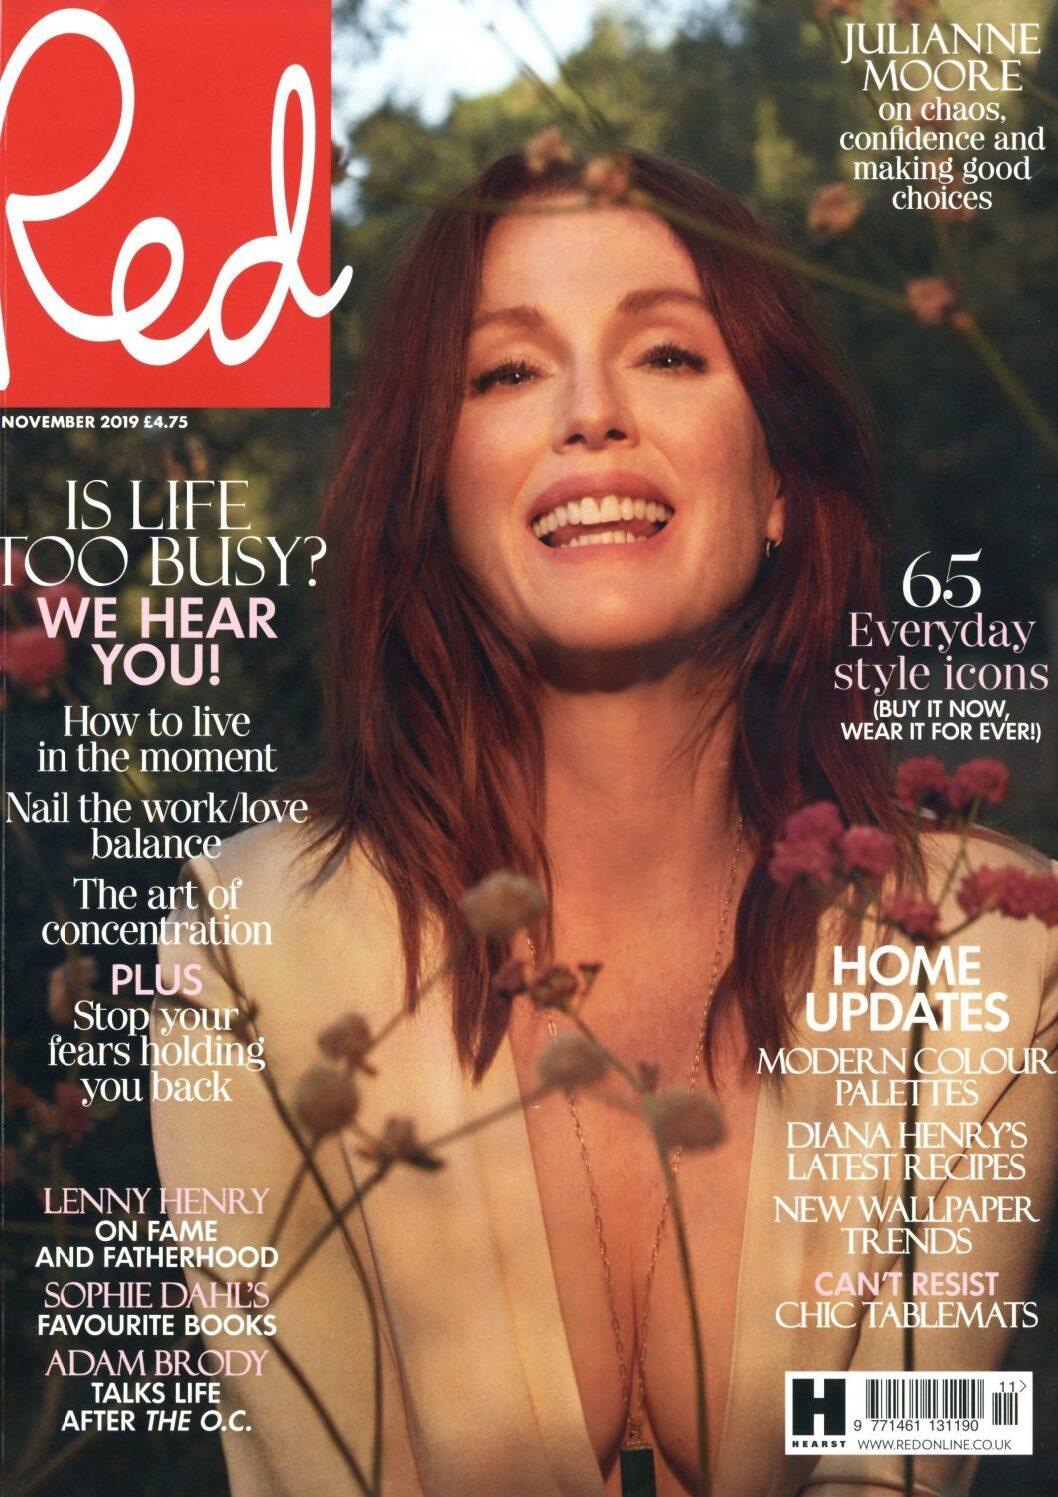 Red Magazine, November 2019